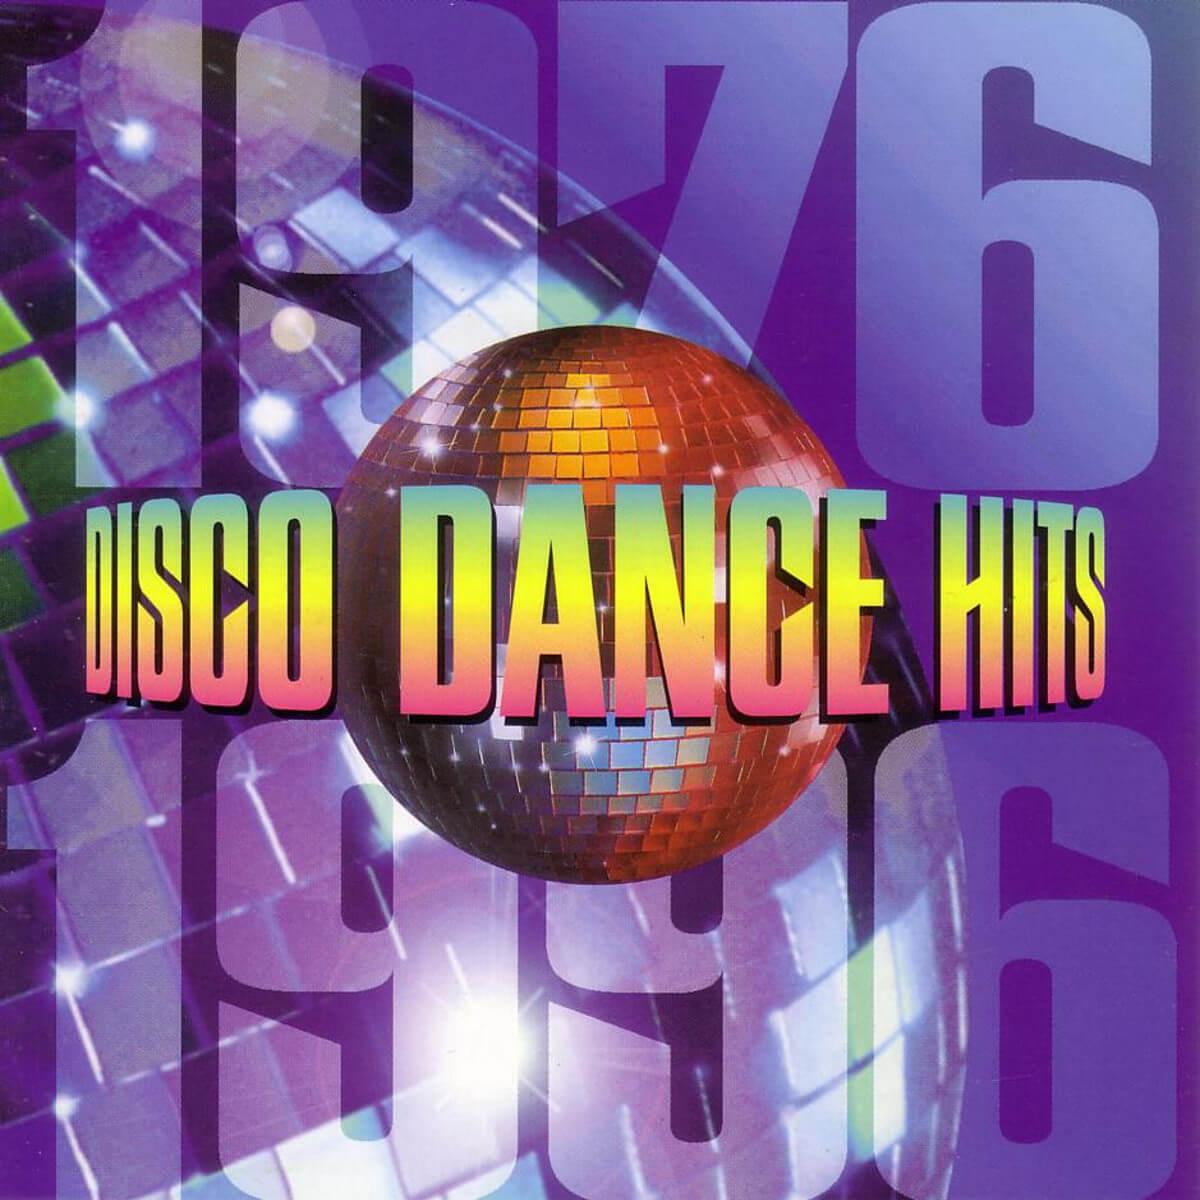 Arte de la música disco